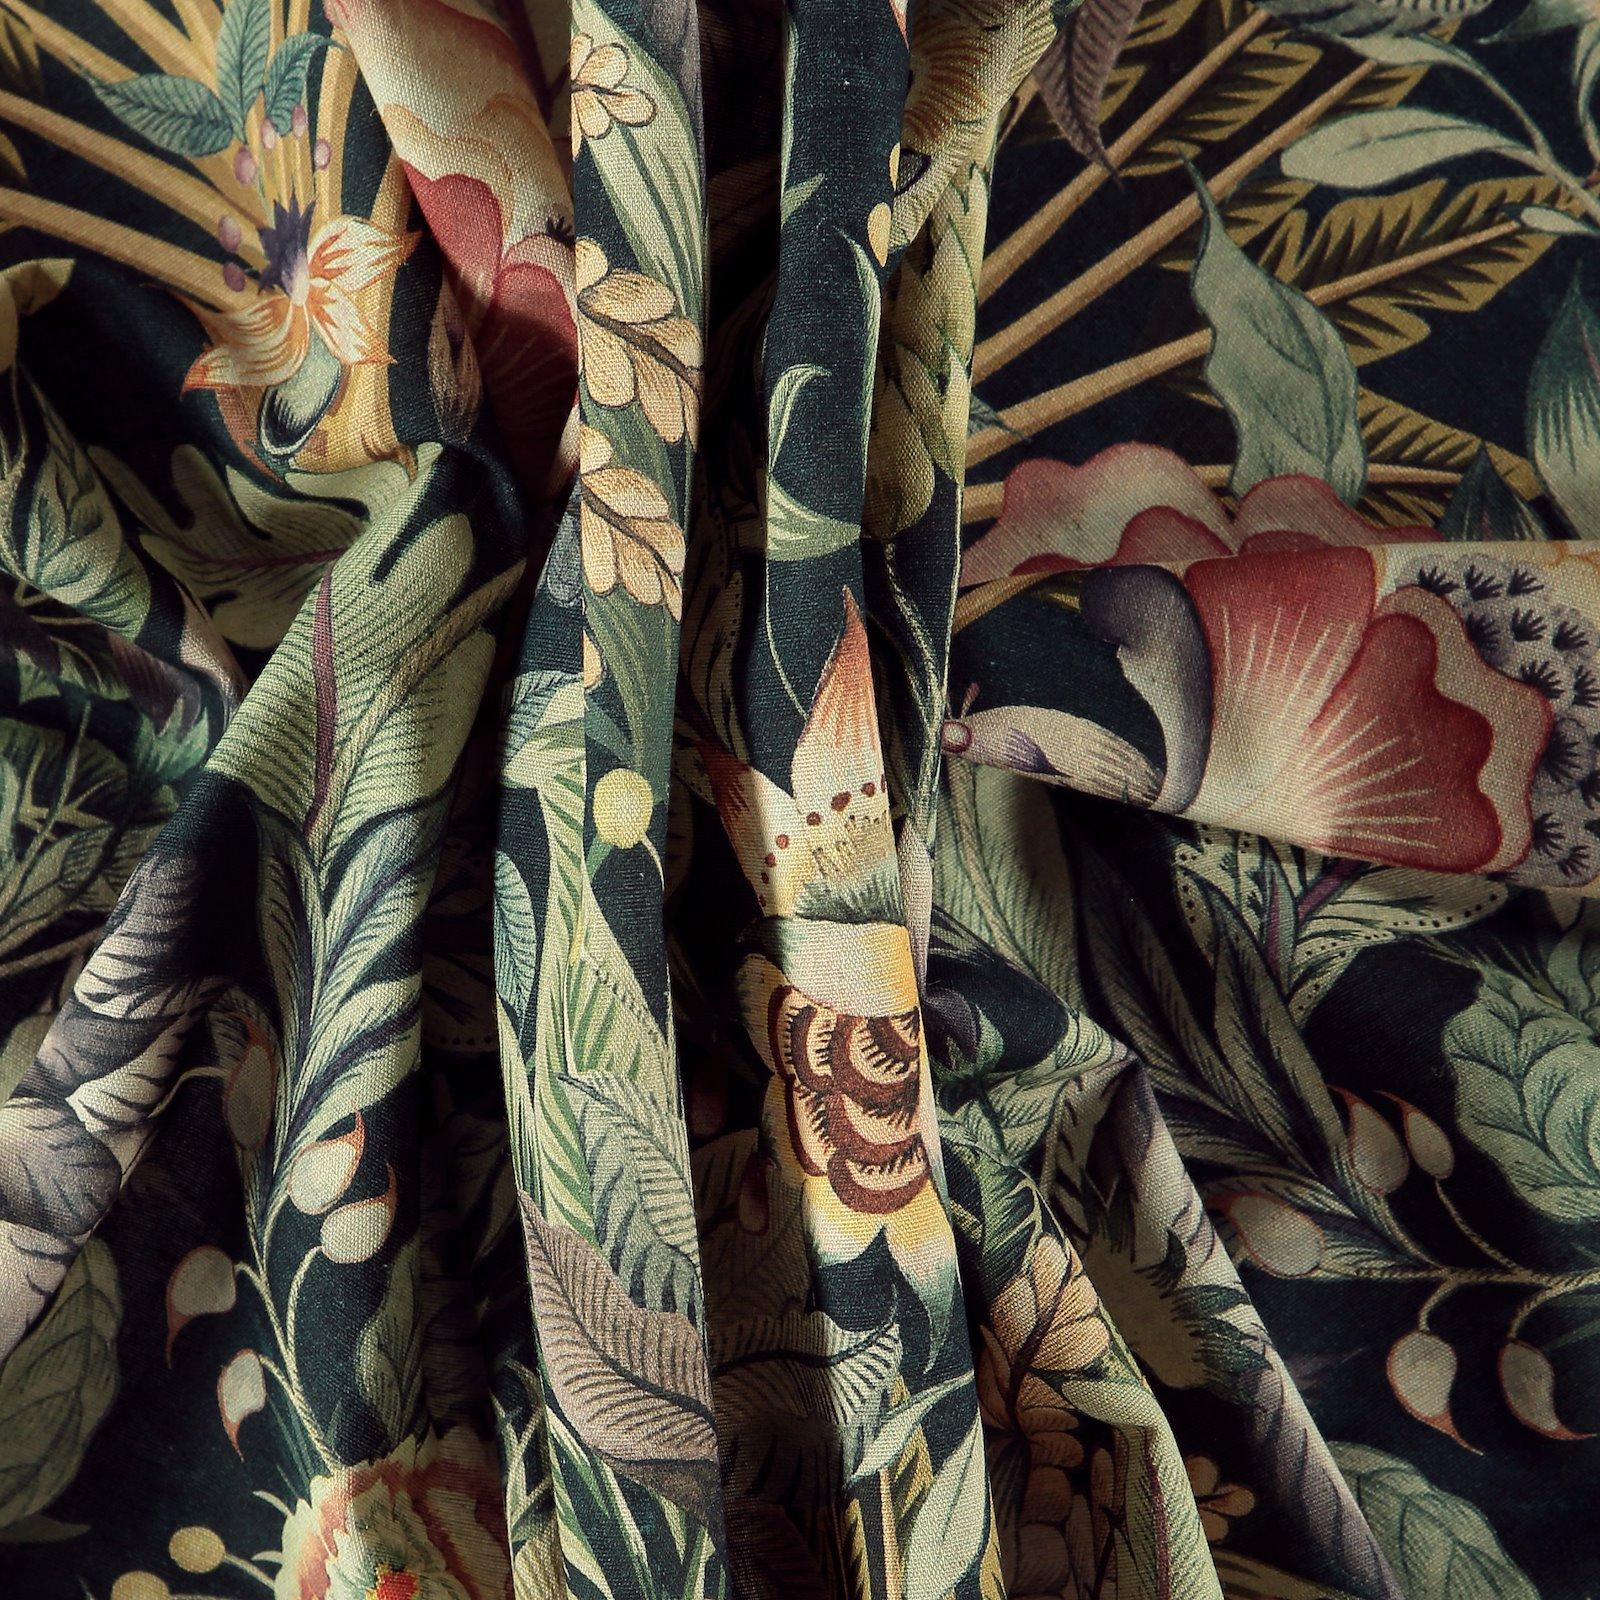 Woven cotton/linen dark petrol w flowers